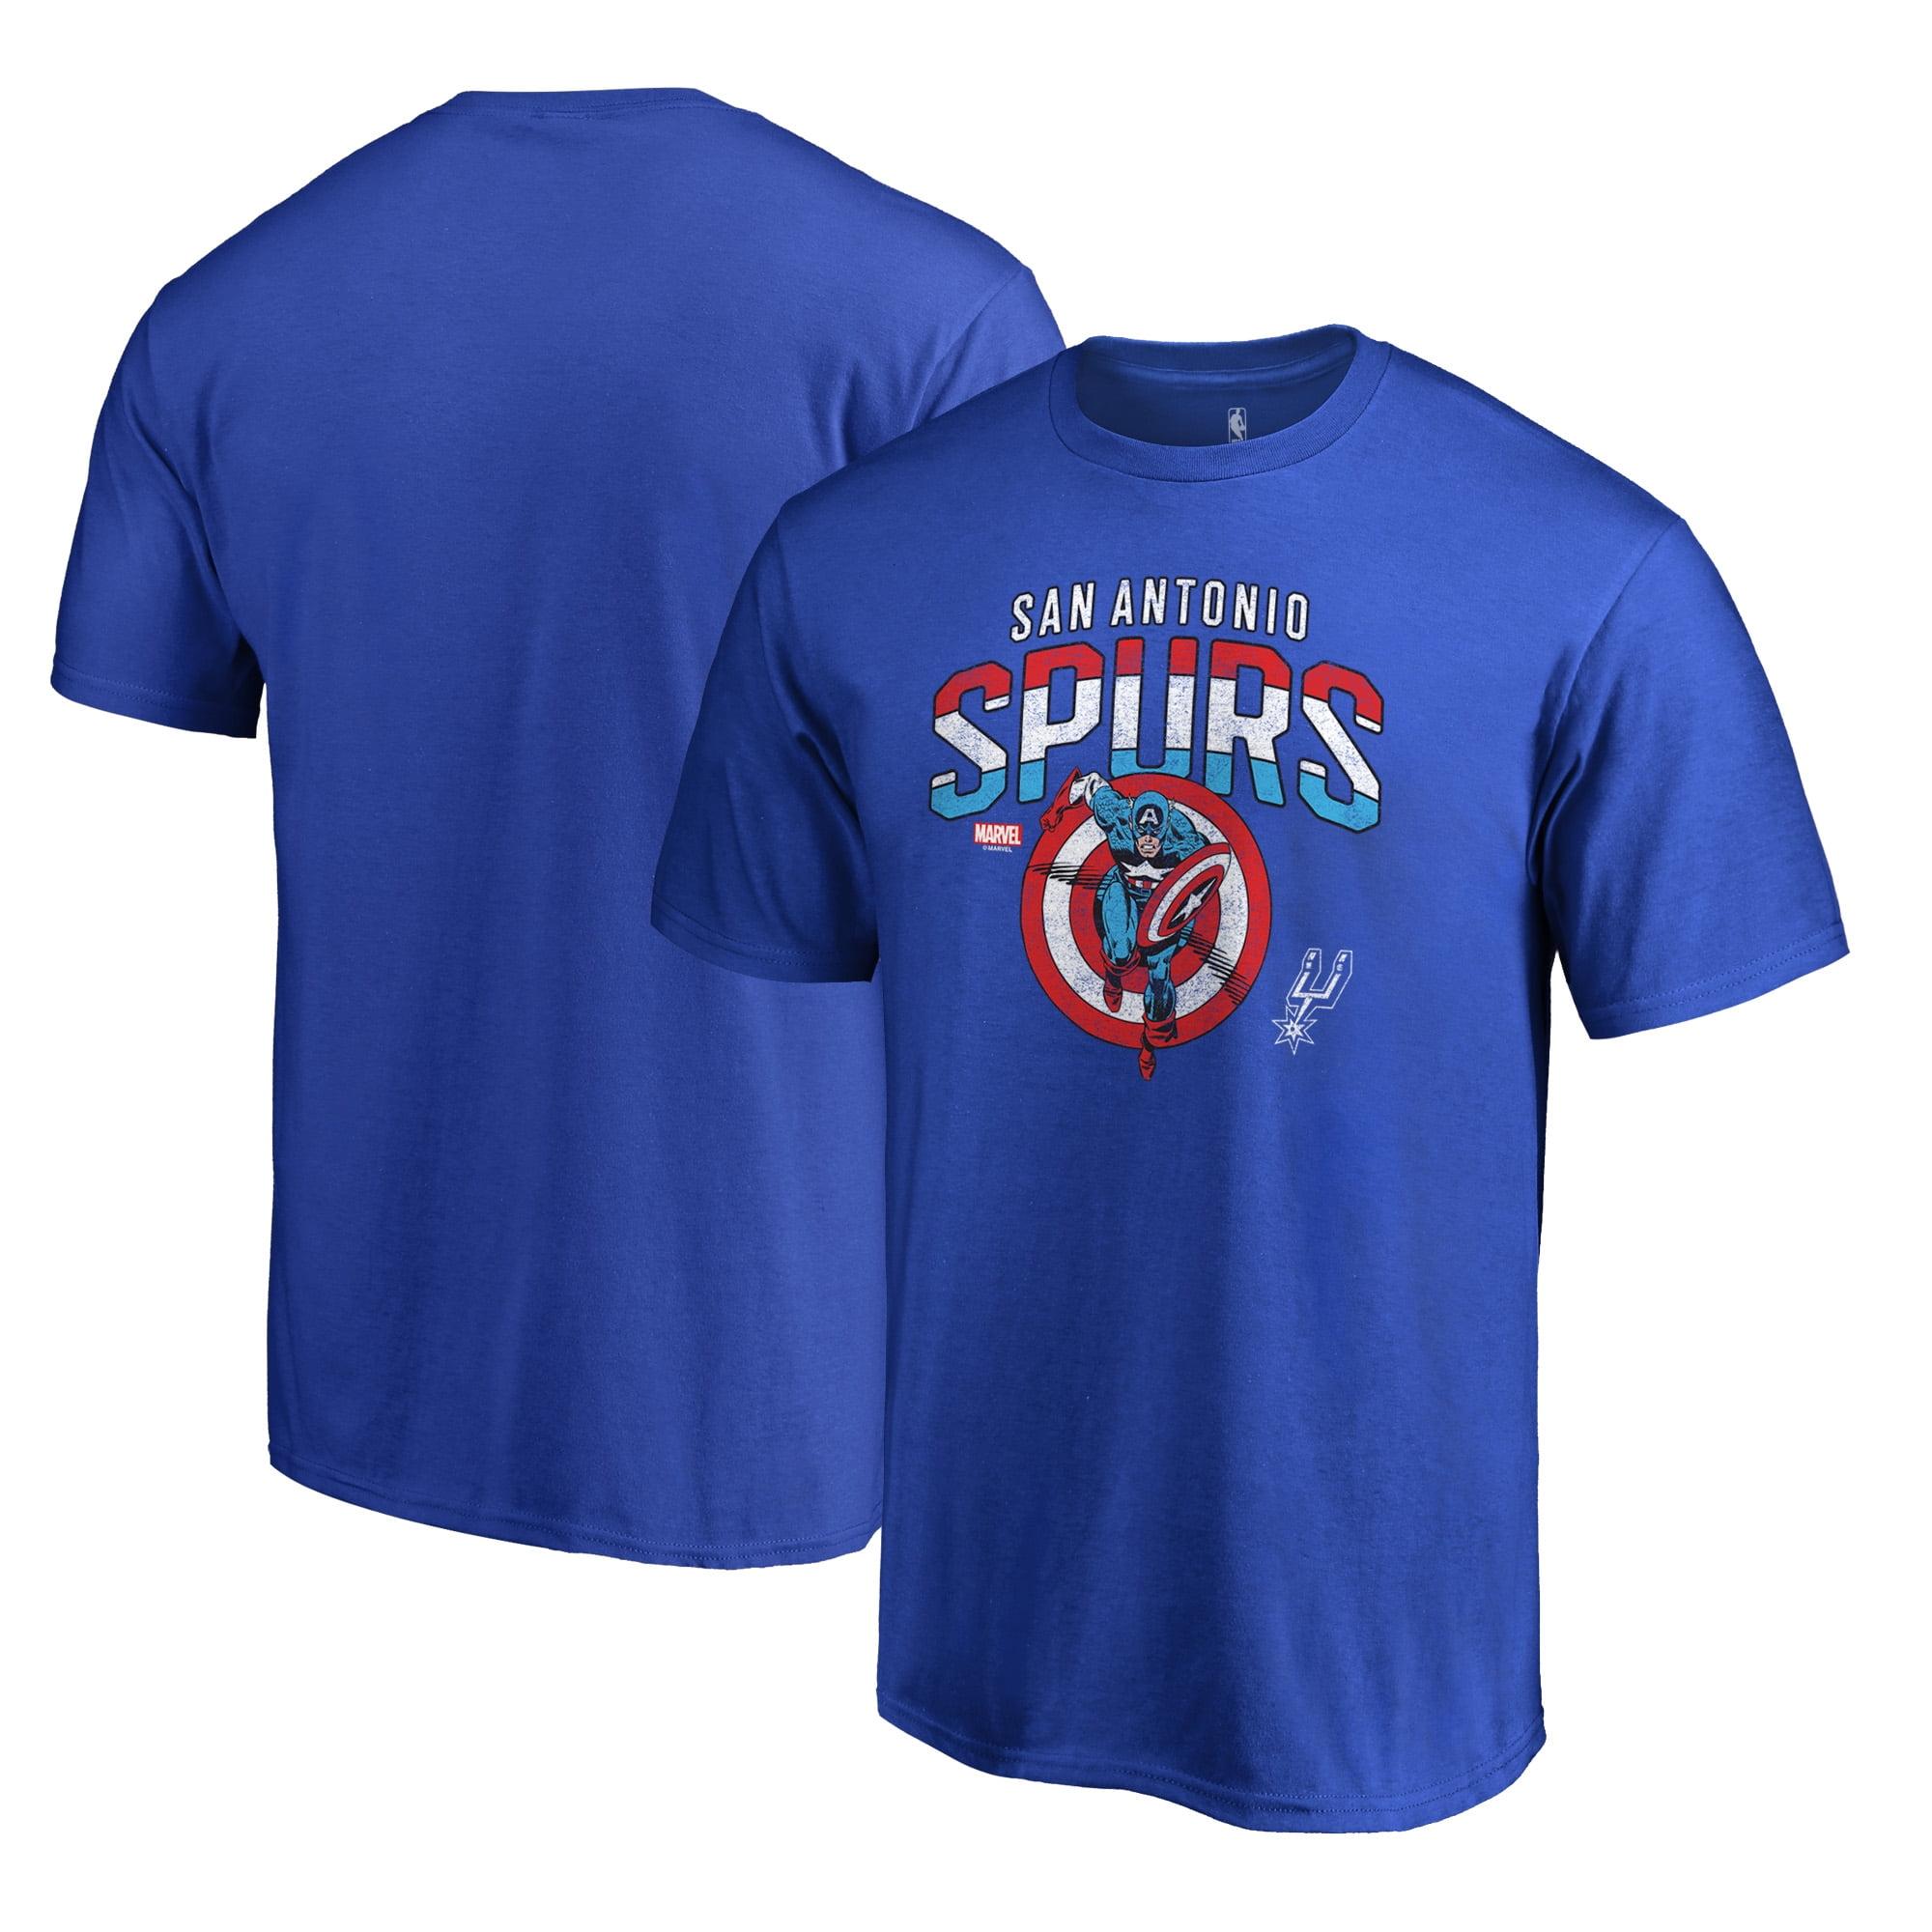 San Antonio Spurs Fanatics Branded Captain's Shield T-Shirt - Royal